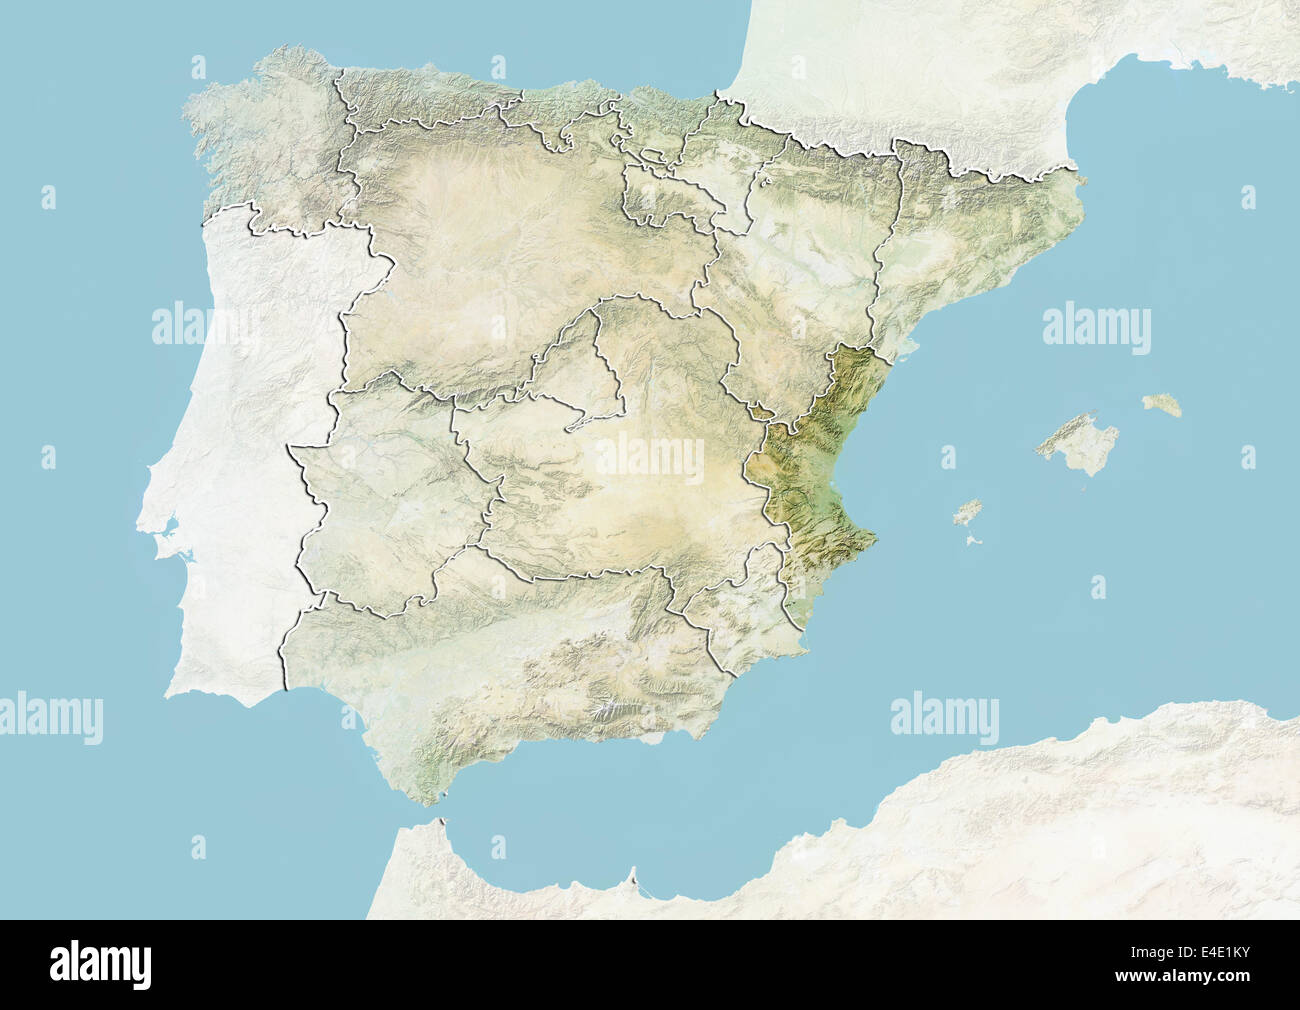 Spain and the Region of Valencia, Relief Map Stock Photo ... on venice italy region map, castilla y leon spain map, spain tourist map, castile map, galicia spain region map, madrid spain region map, barcelona spain region map, hong kong china region map, rioja spain wine region map,